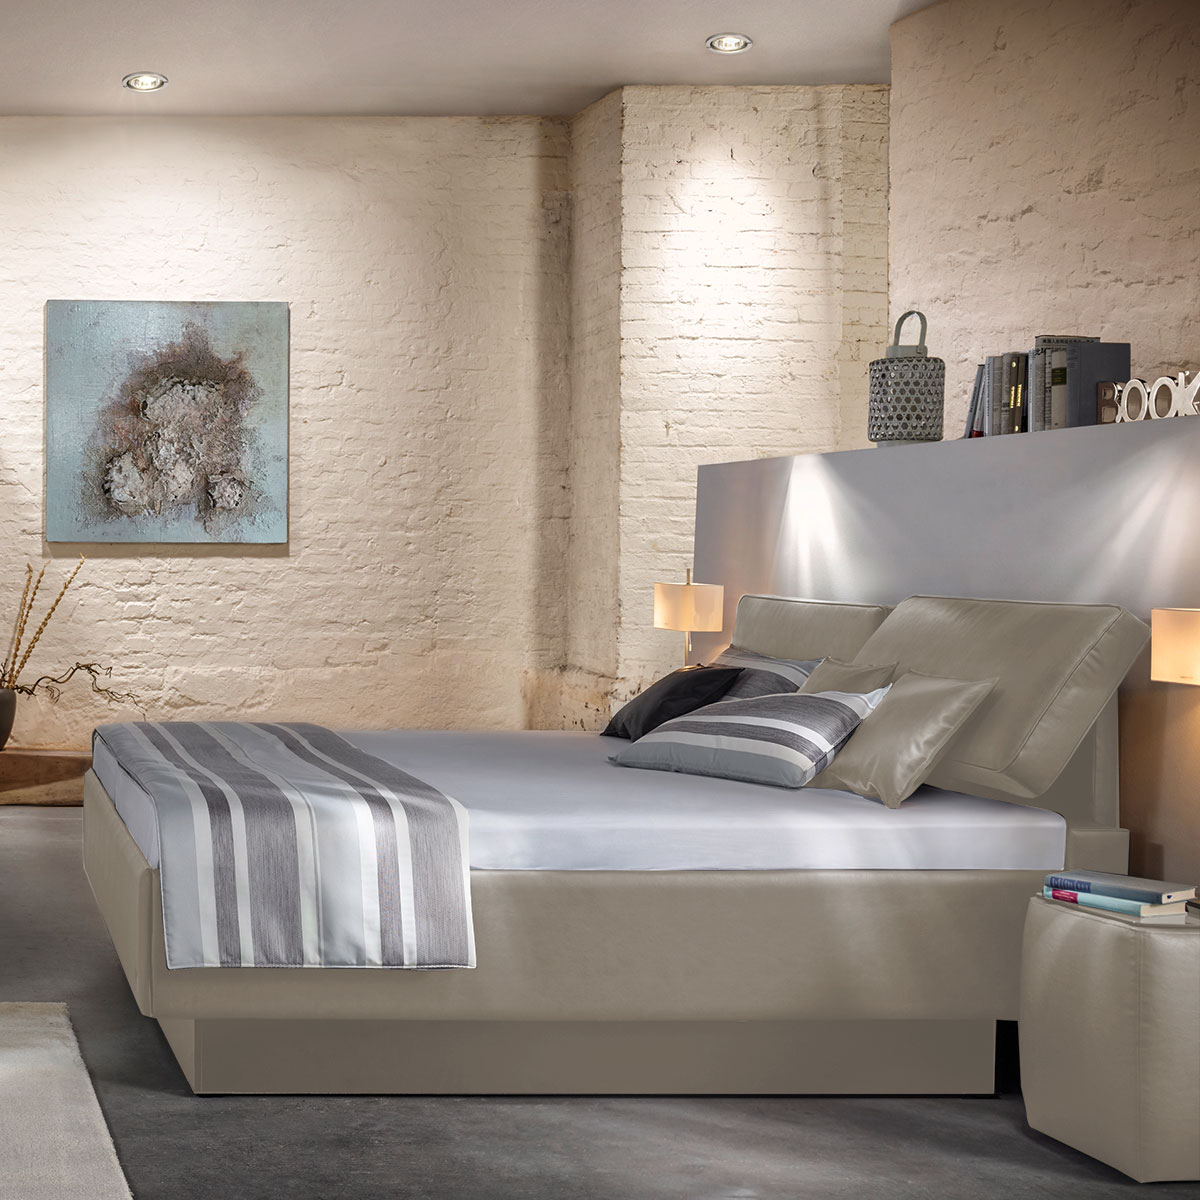 polsterbett g nstig kaufen flamme. Black Bedroom Furniture Sets. Home Design Ideas